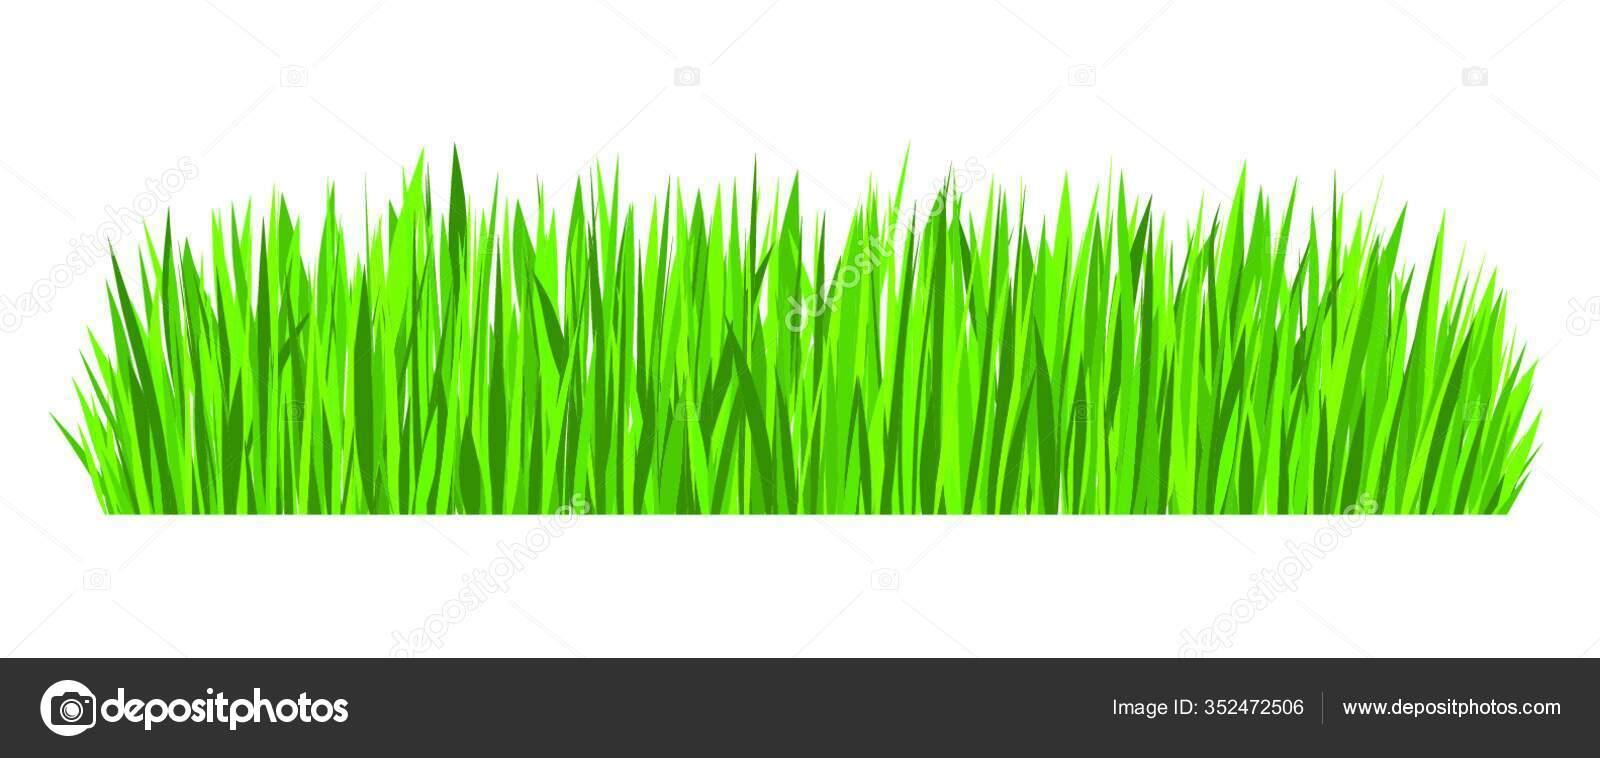 green grass border vector design element isolated white background stock vector c panthermediaseller 352472506 https depositphotos com 352472506 stock illustration green grass border vector design html